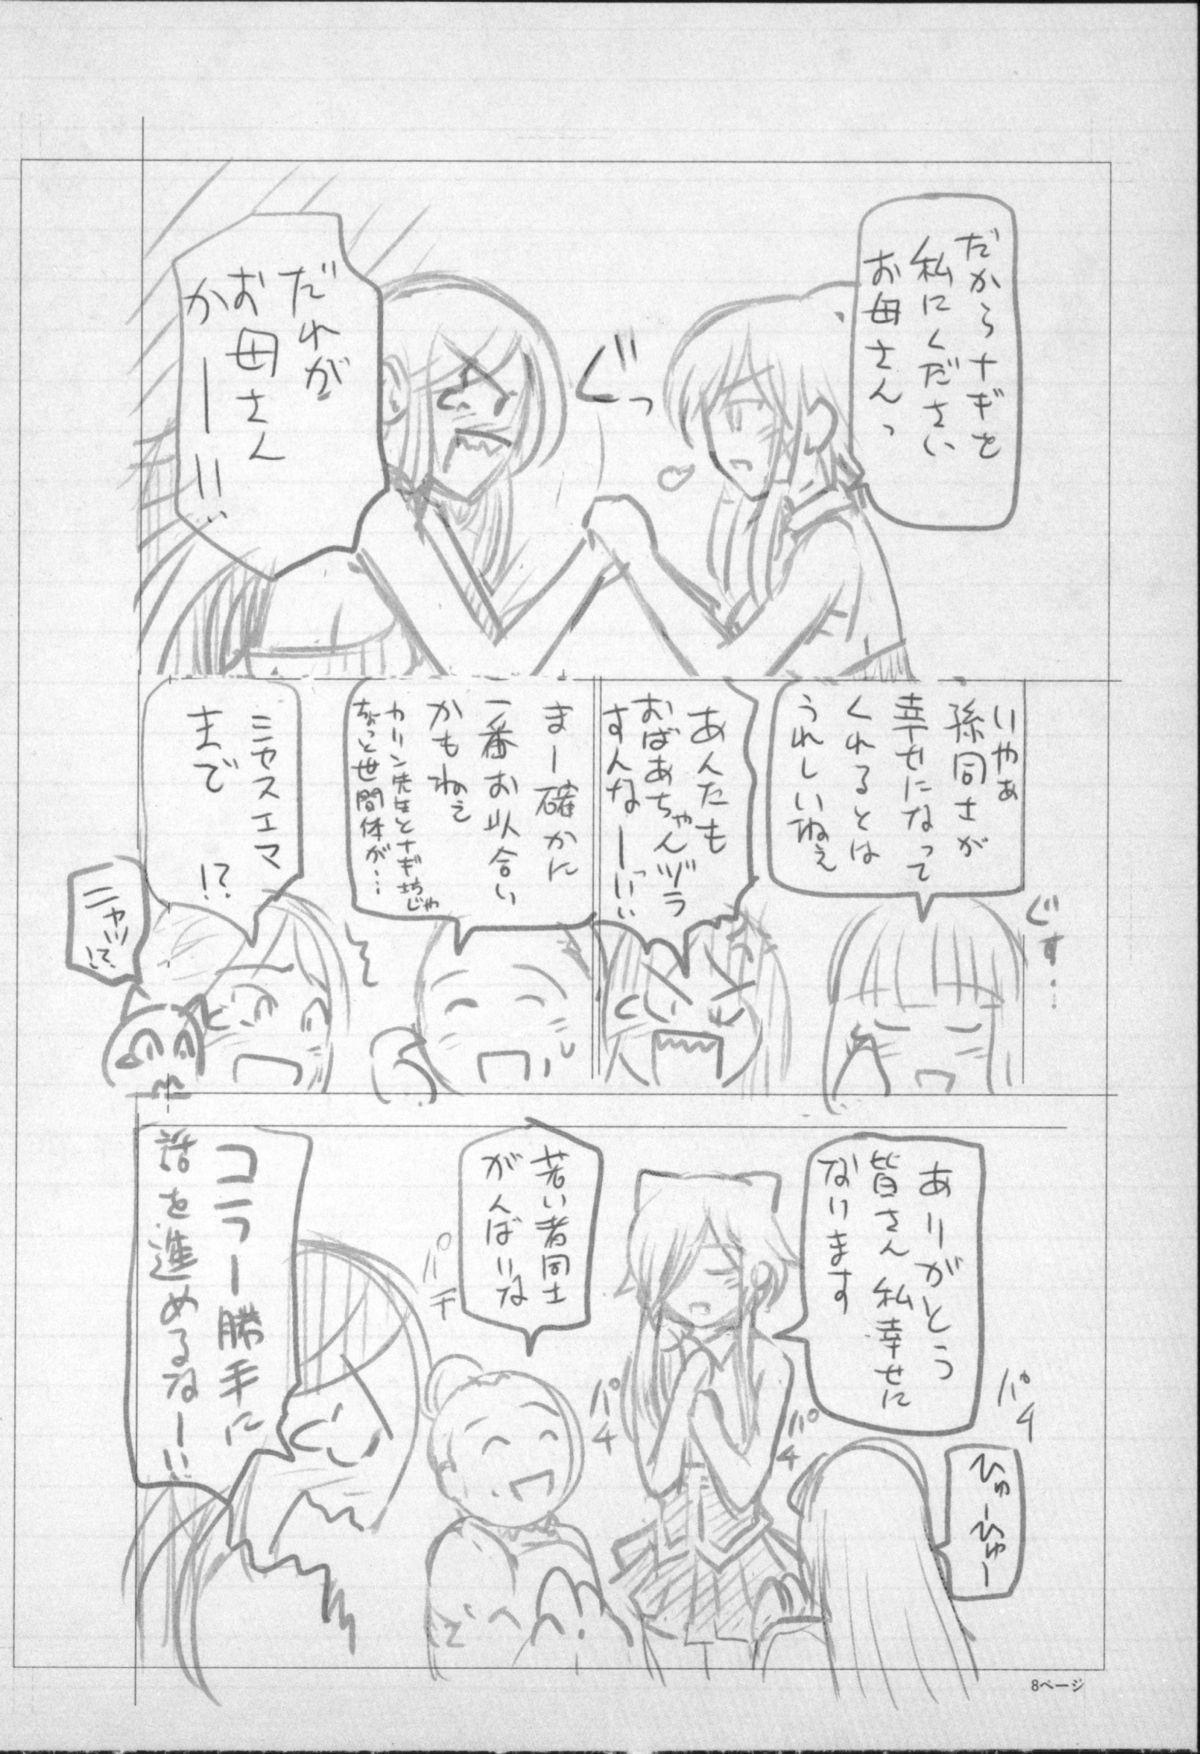 Majo × Shota ~ Genteiban | 魔女X小正太 限定版 263